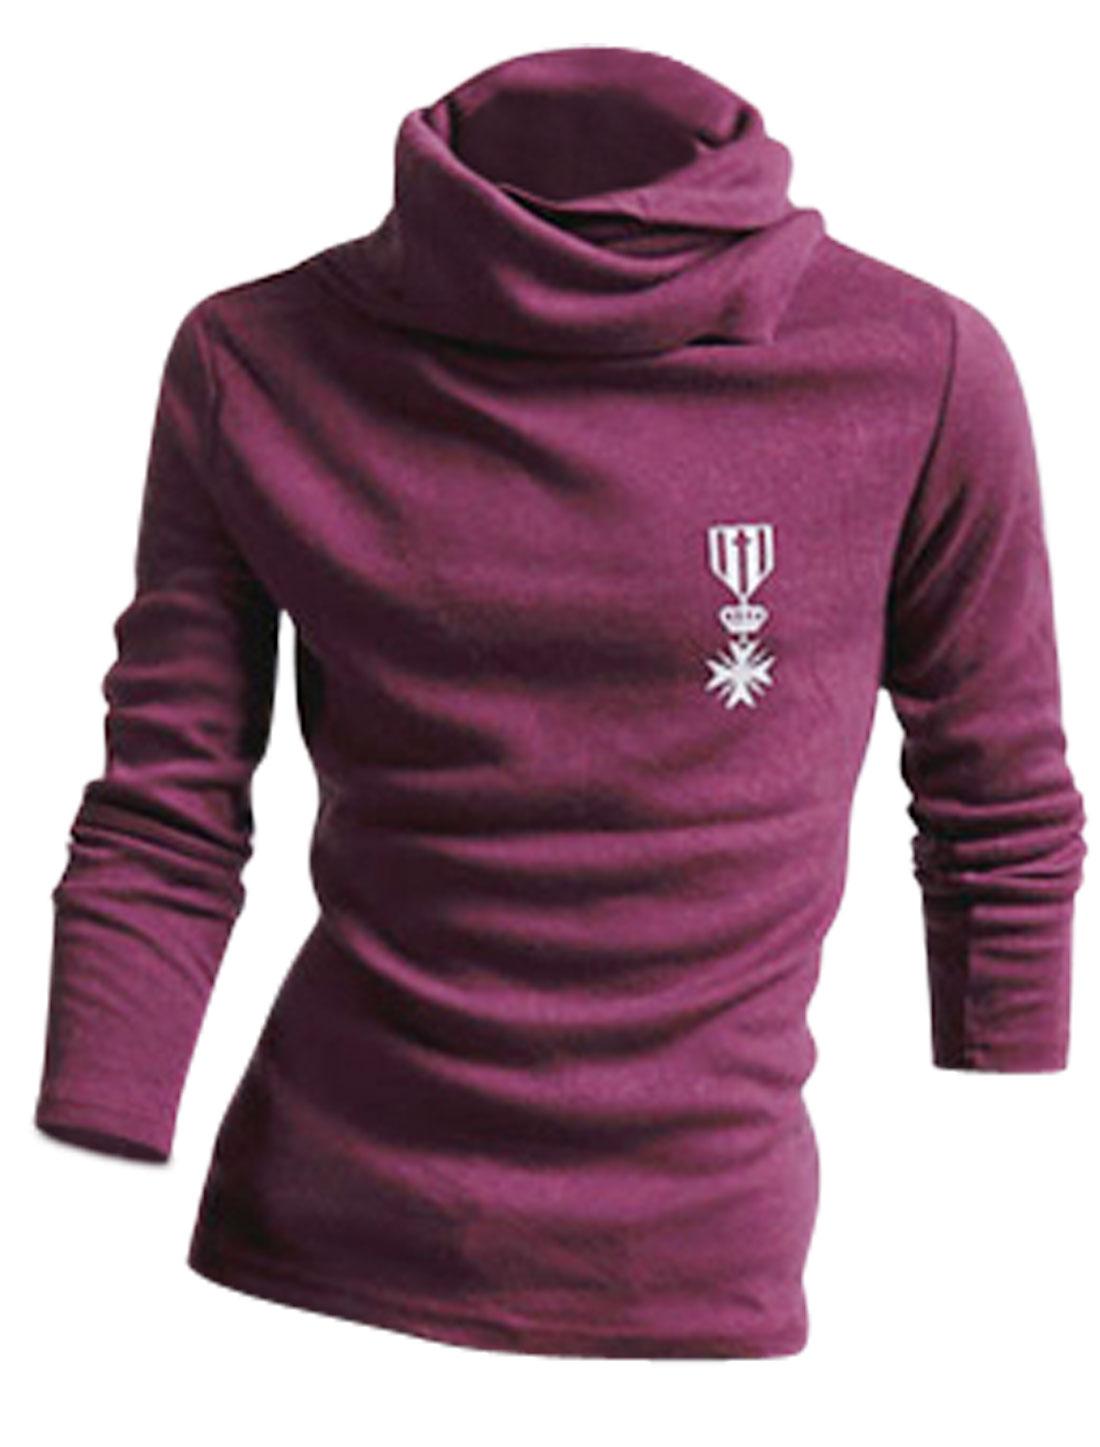 Men Cowl Neck Long Sleeves Autumn Wearing Top Shirt Purple M